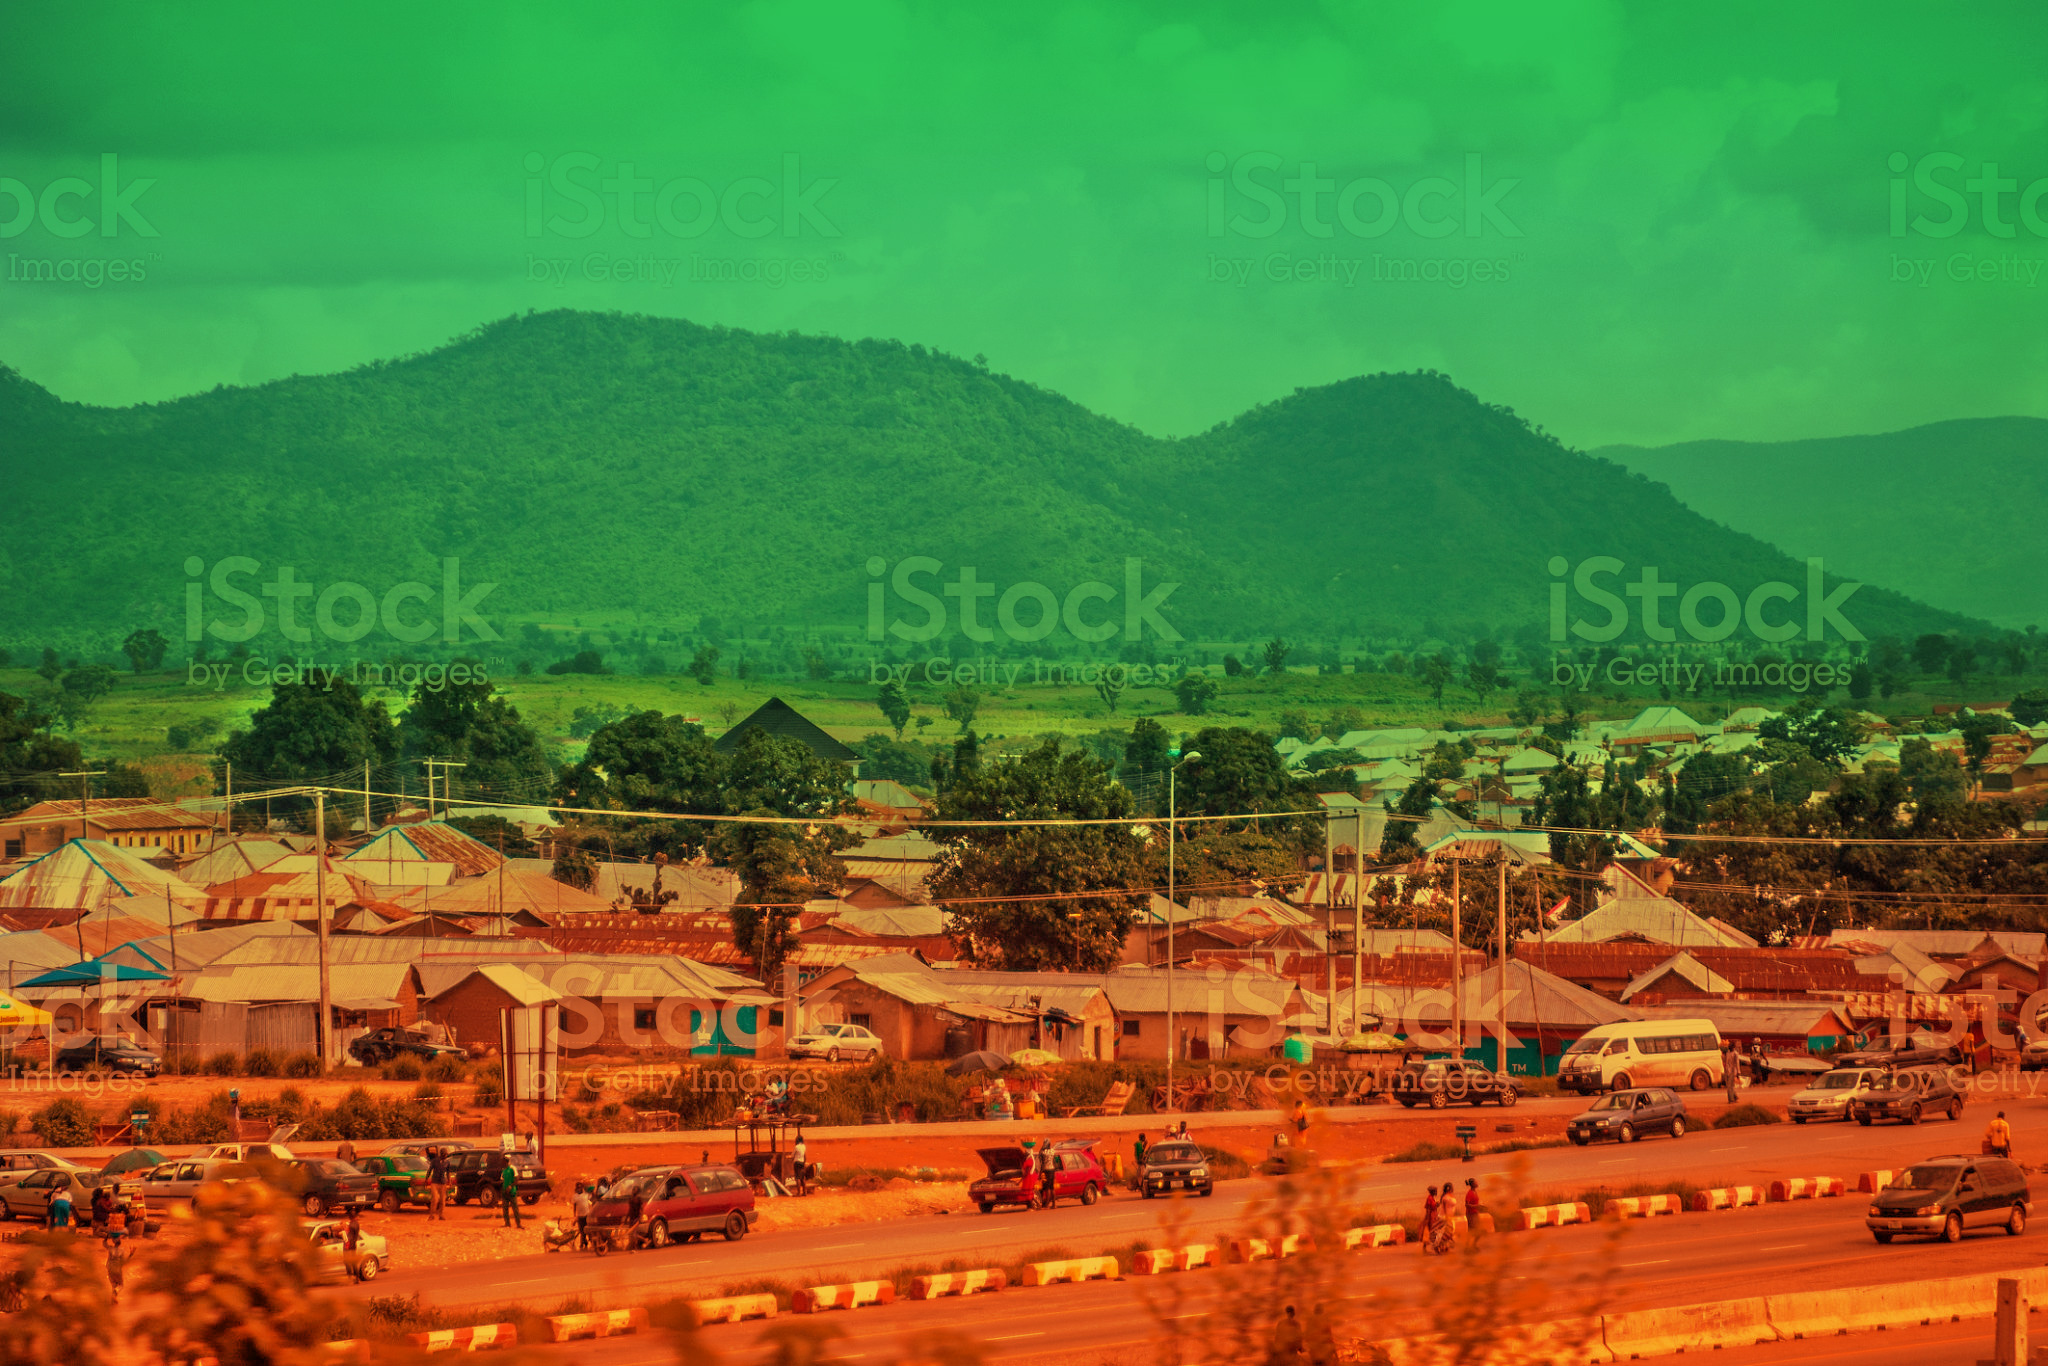 Nigeria visual 3.jpg